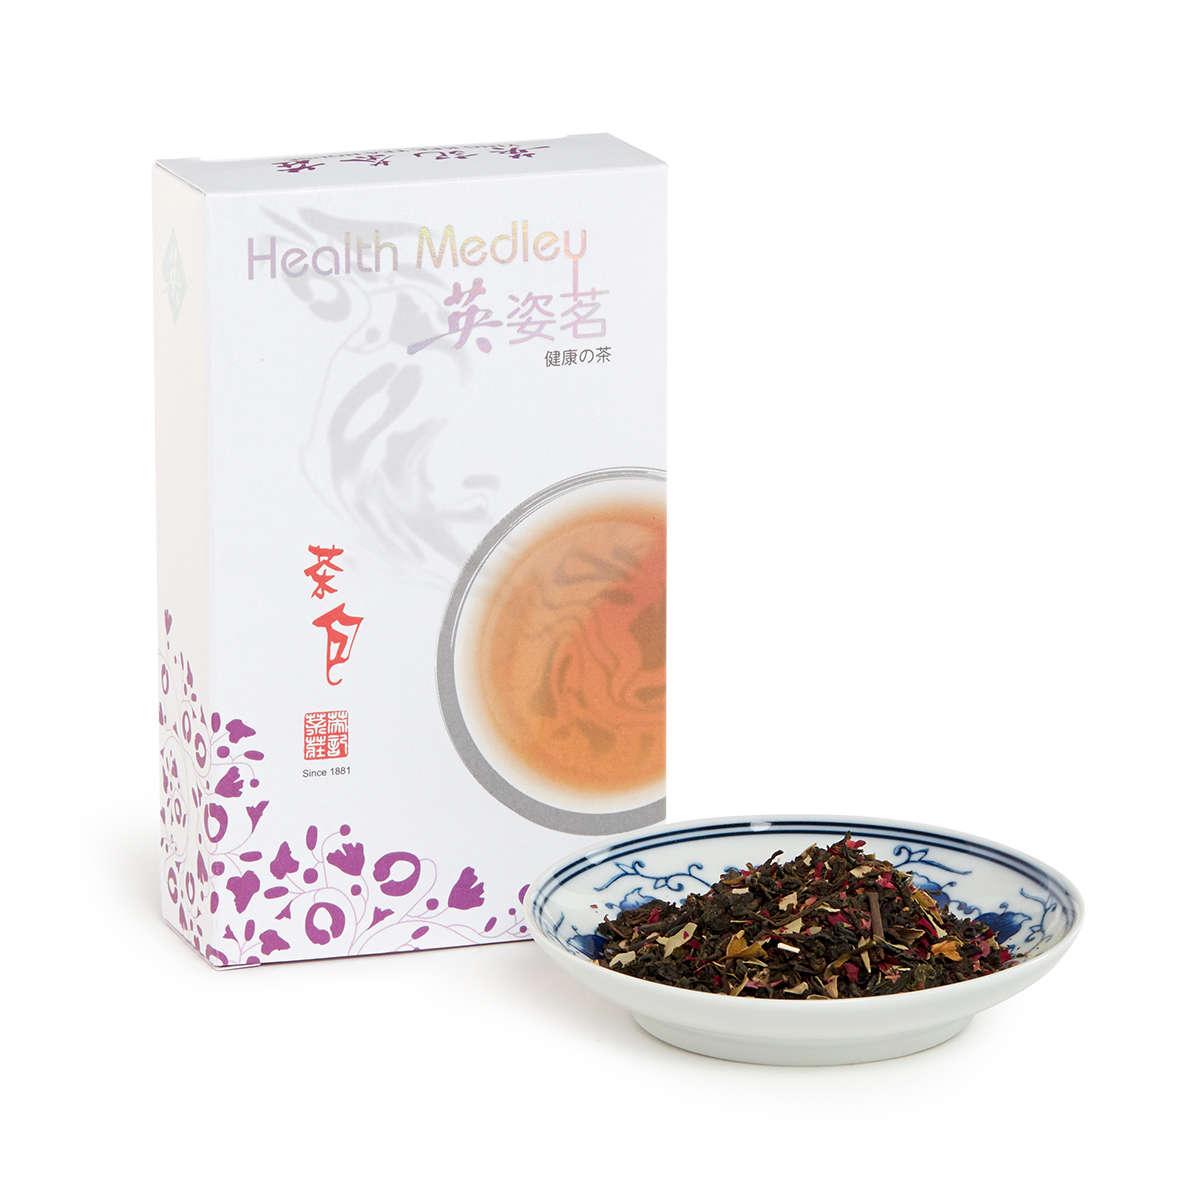 Health Medley Teabag (60g)